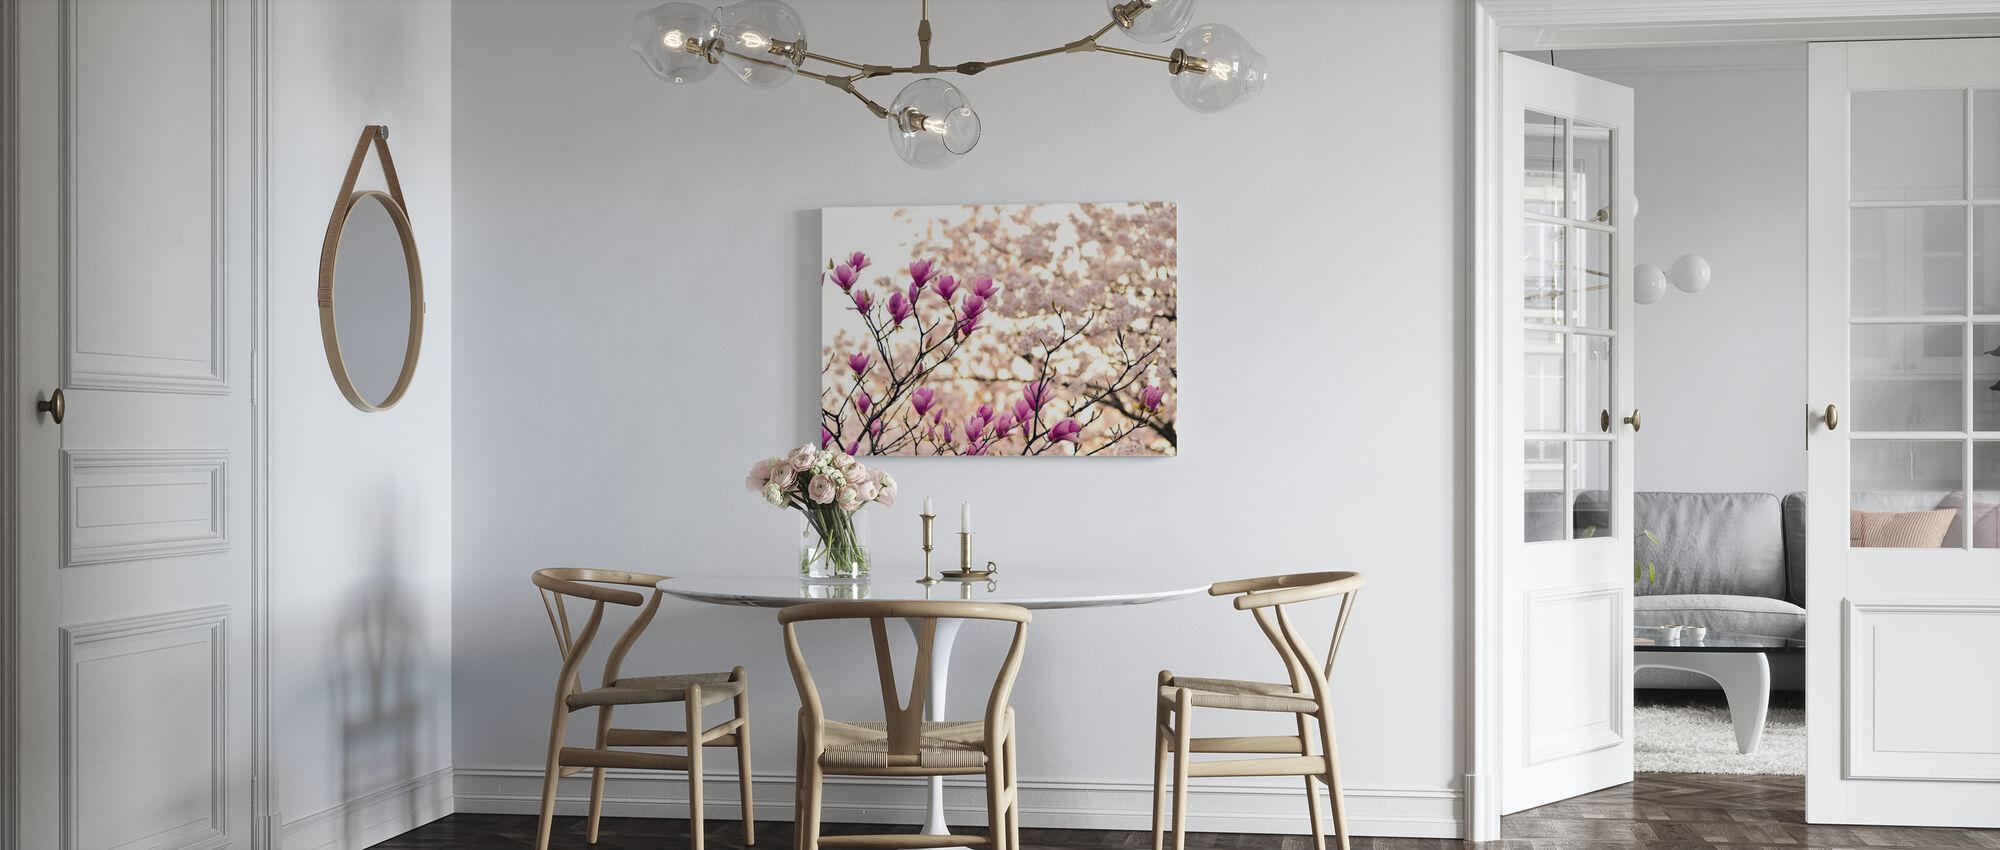 Magnolia Bloemen - Canvas print - Keuken